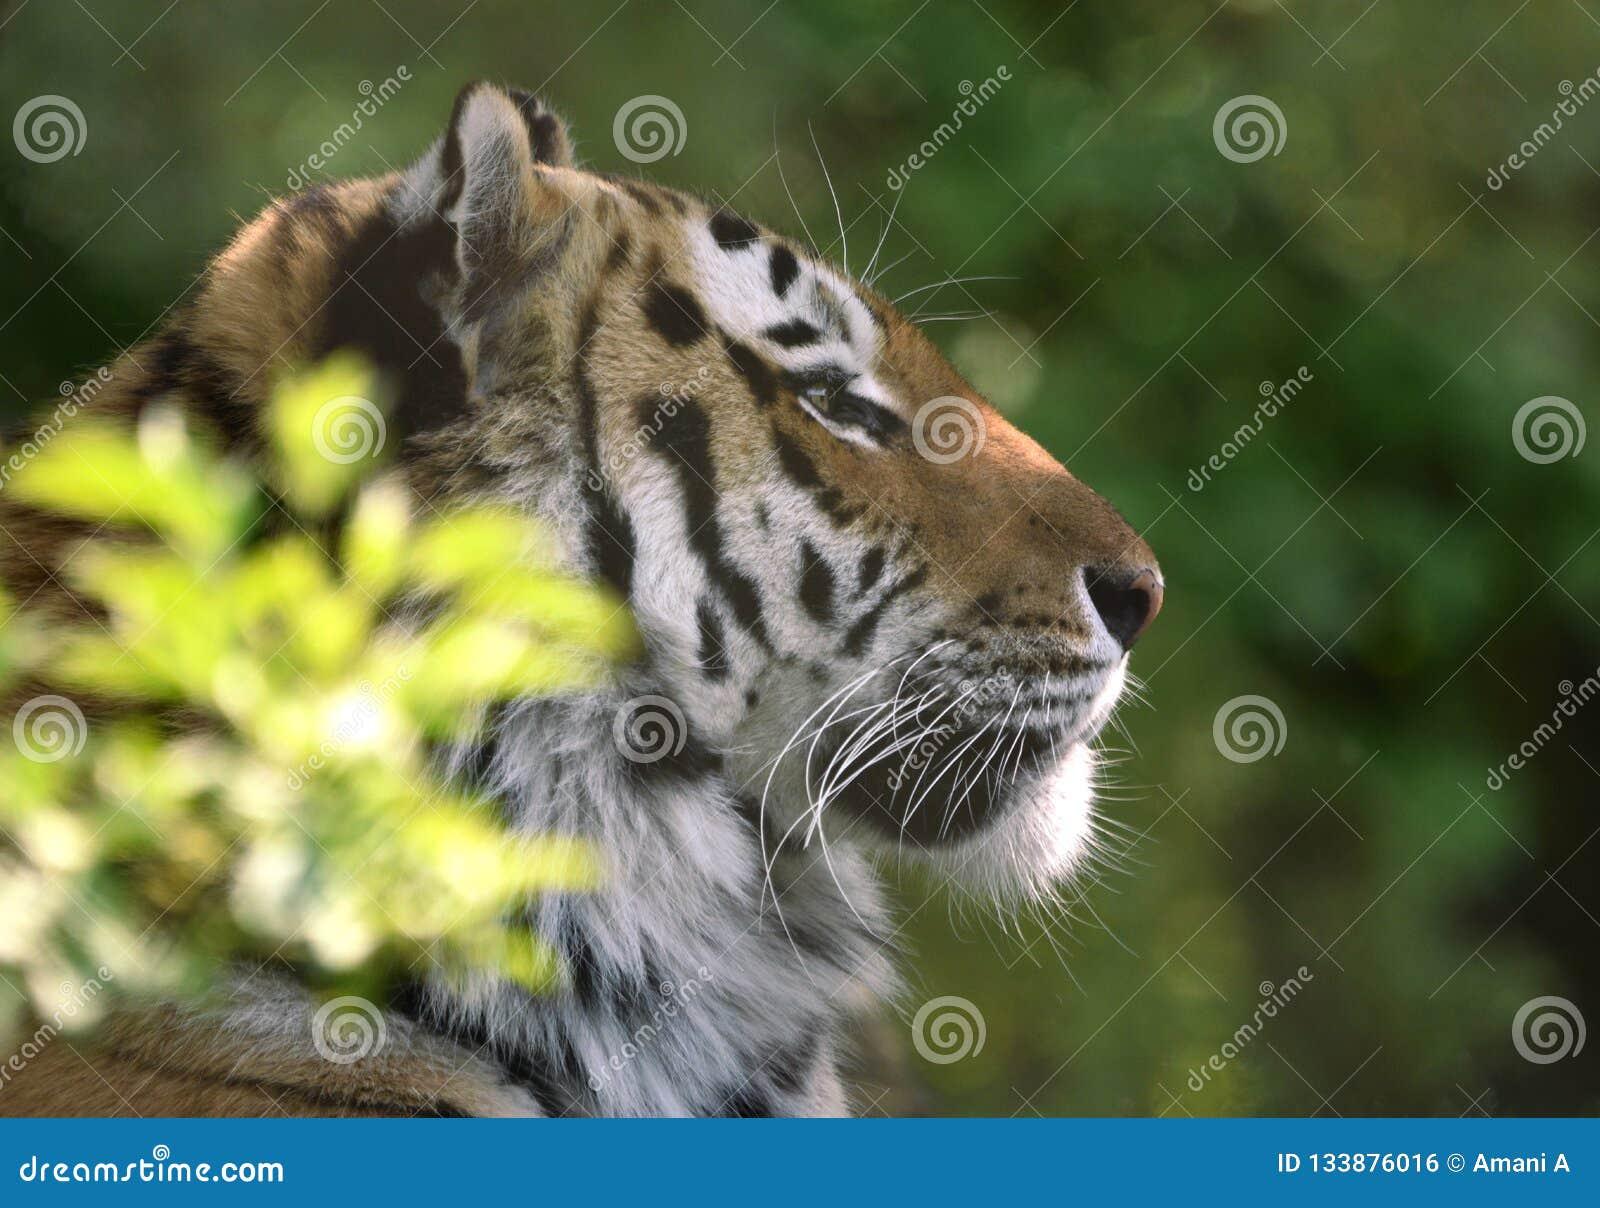 Siberian tiger in dappled shade